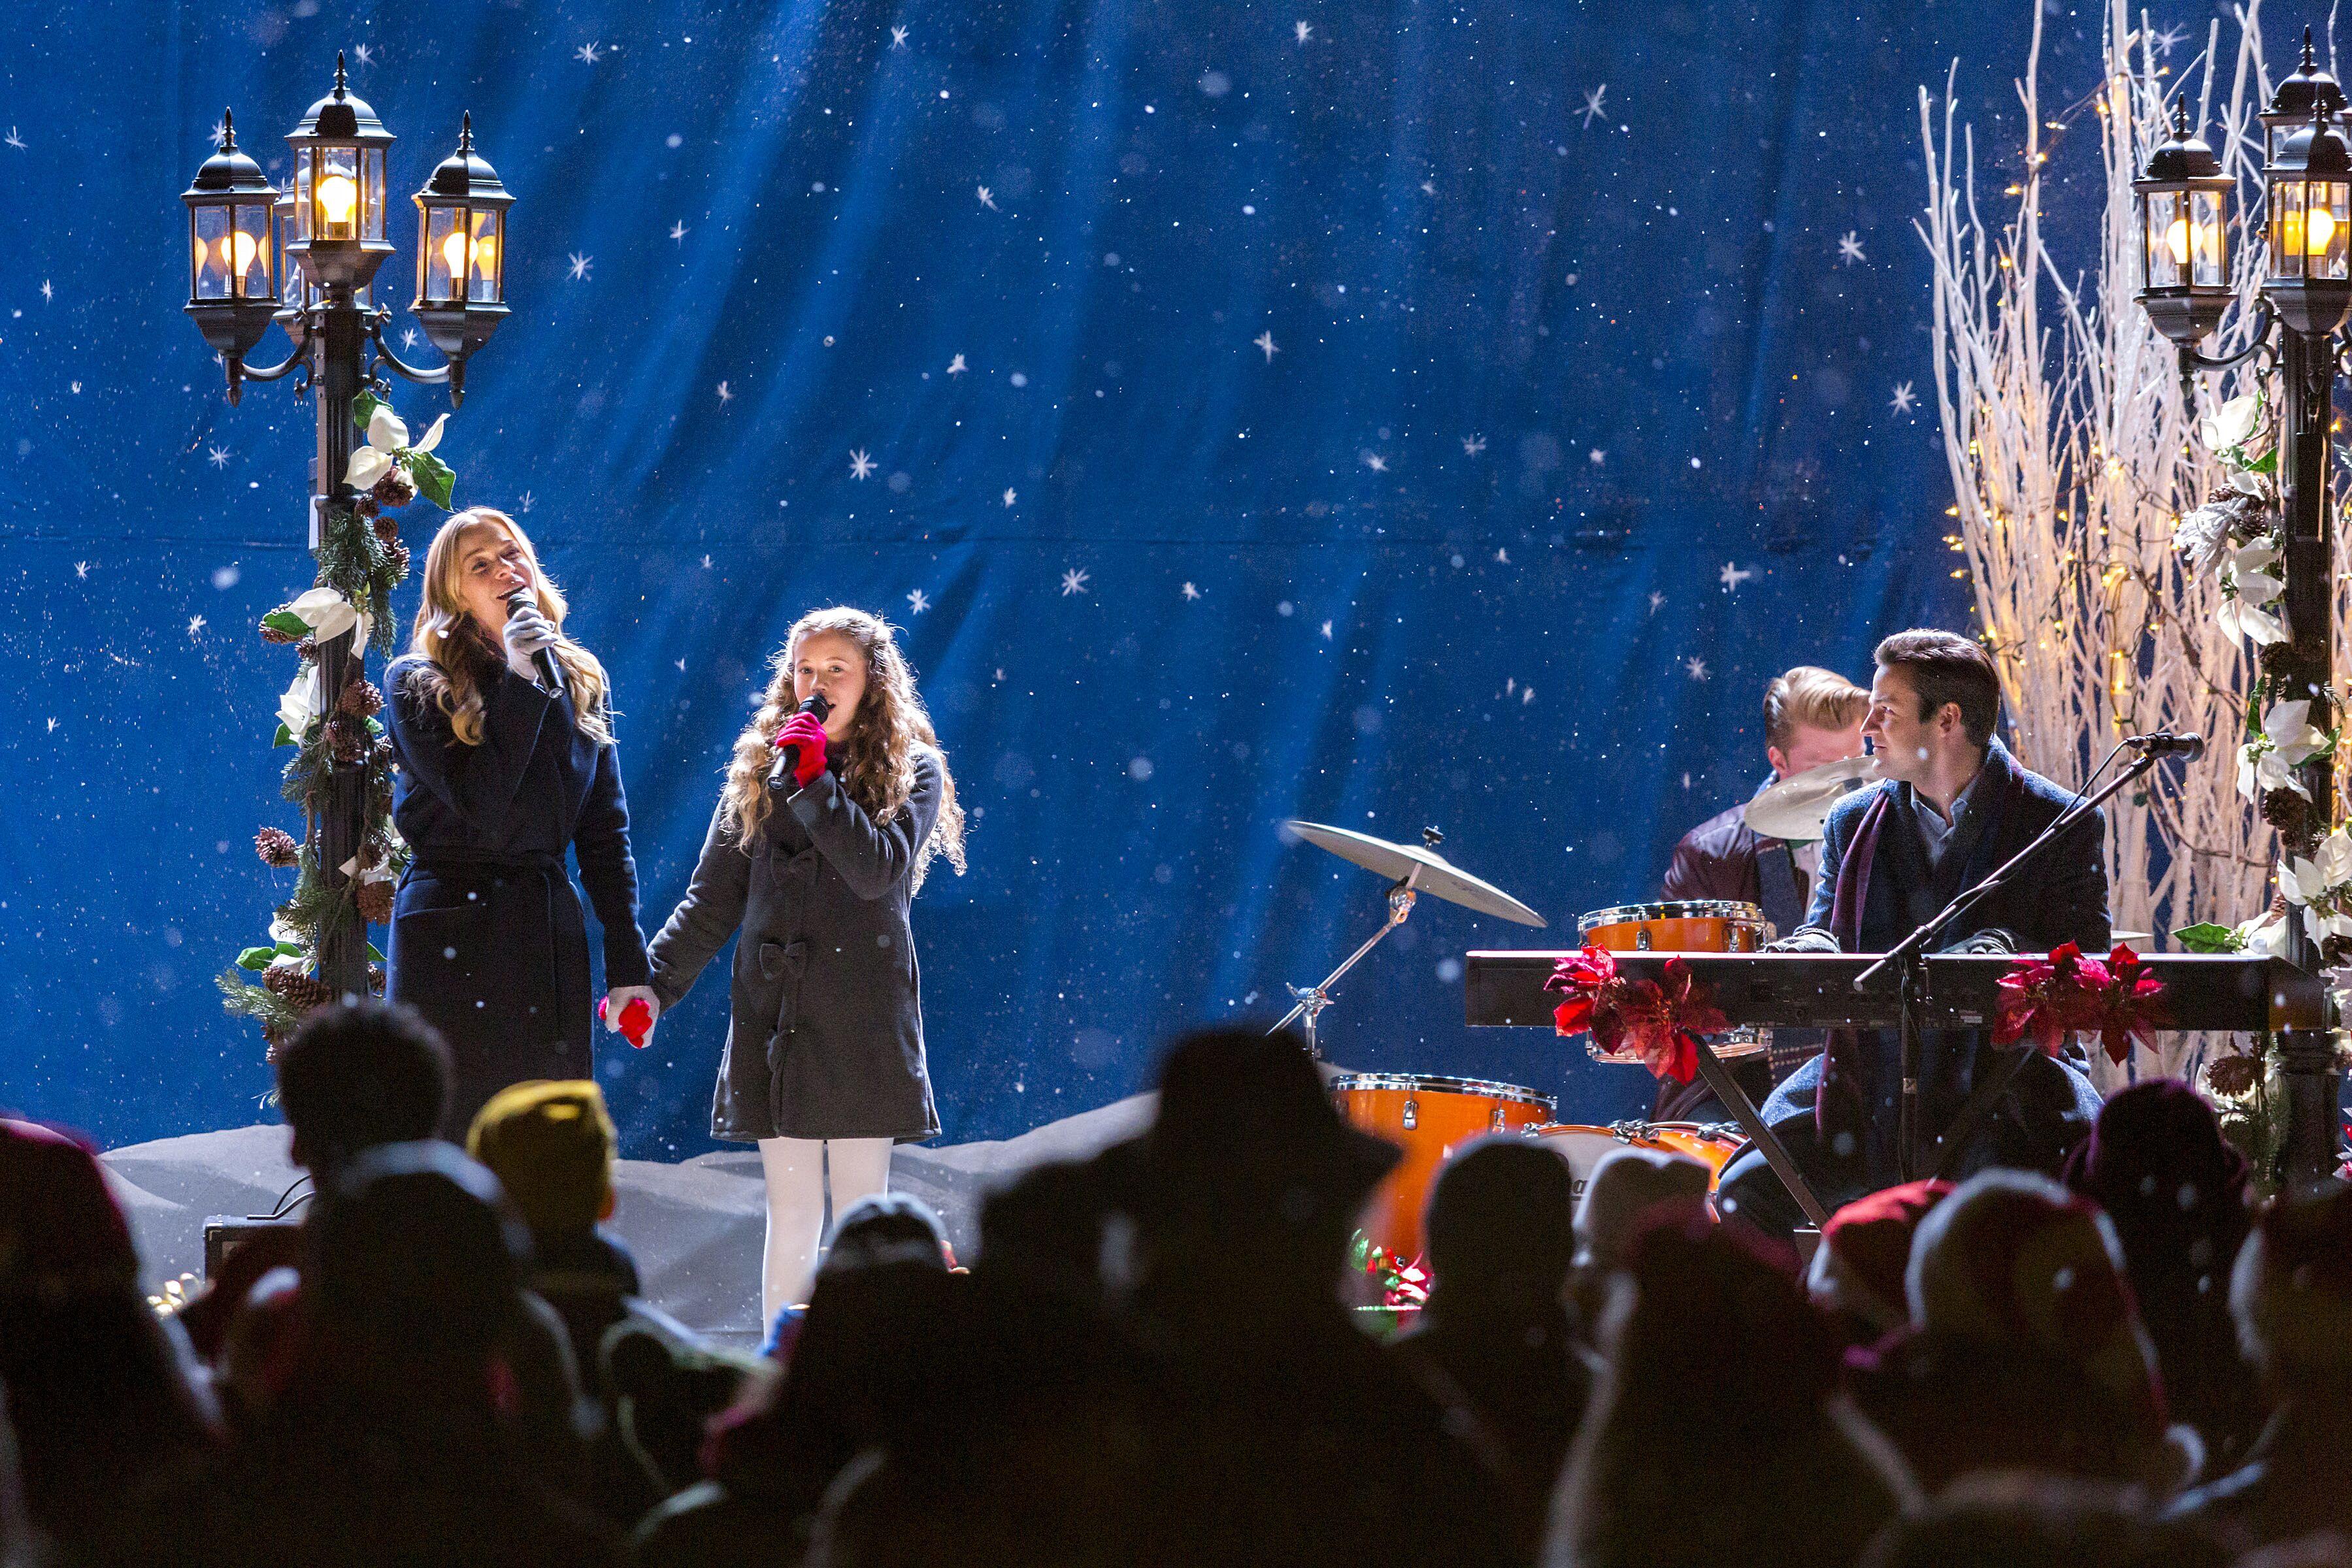 LeAnn Rimes shares why she's always in the Christmas spirit